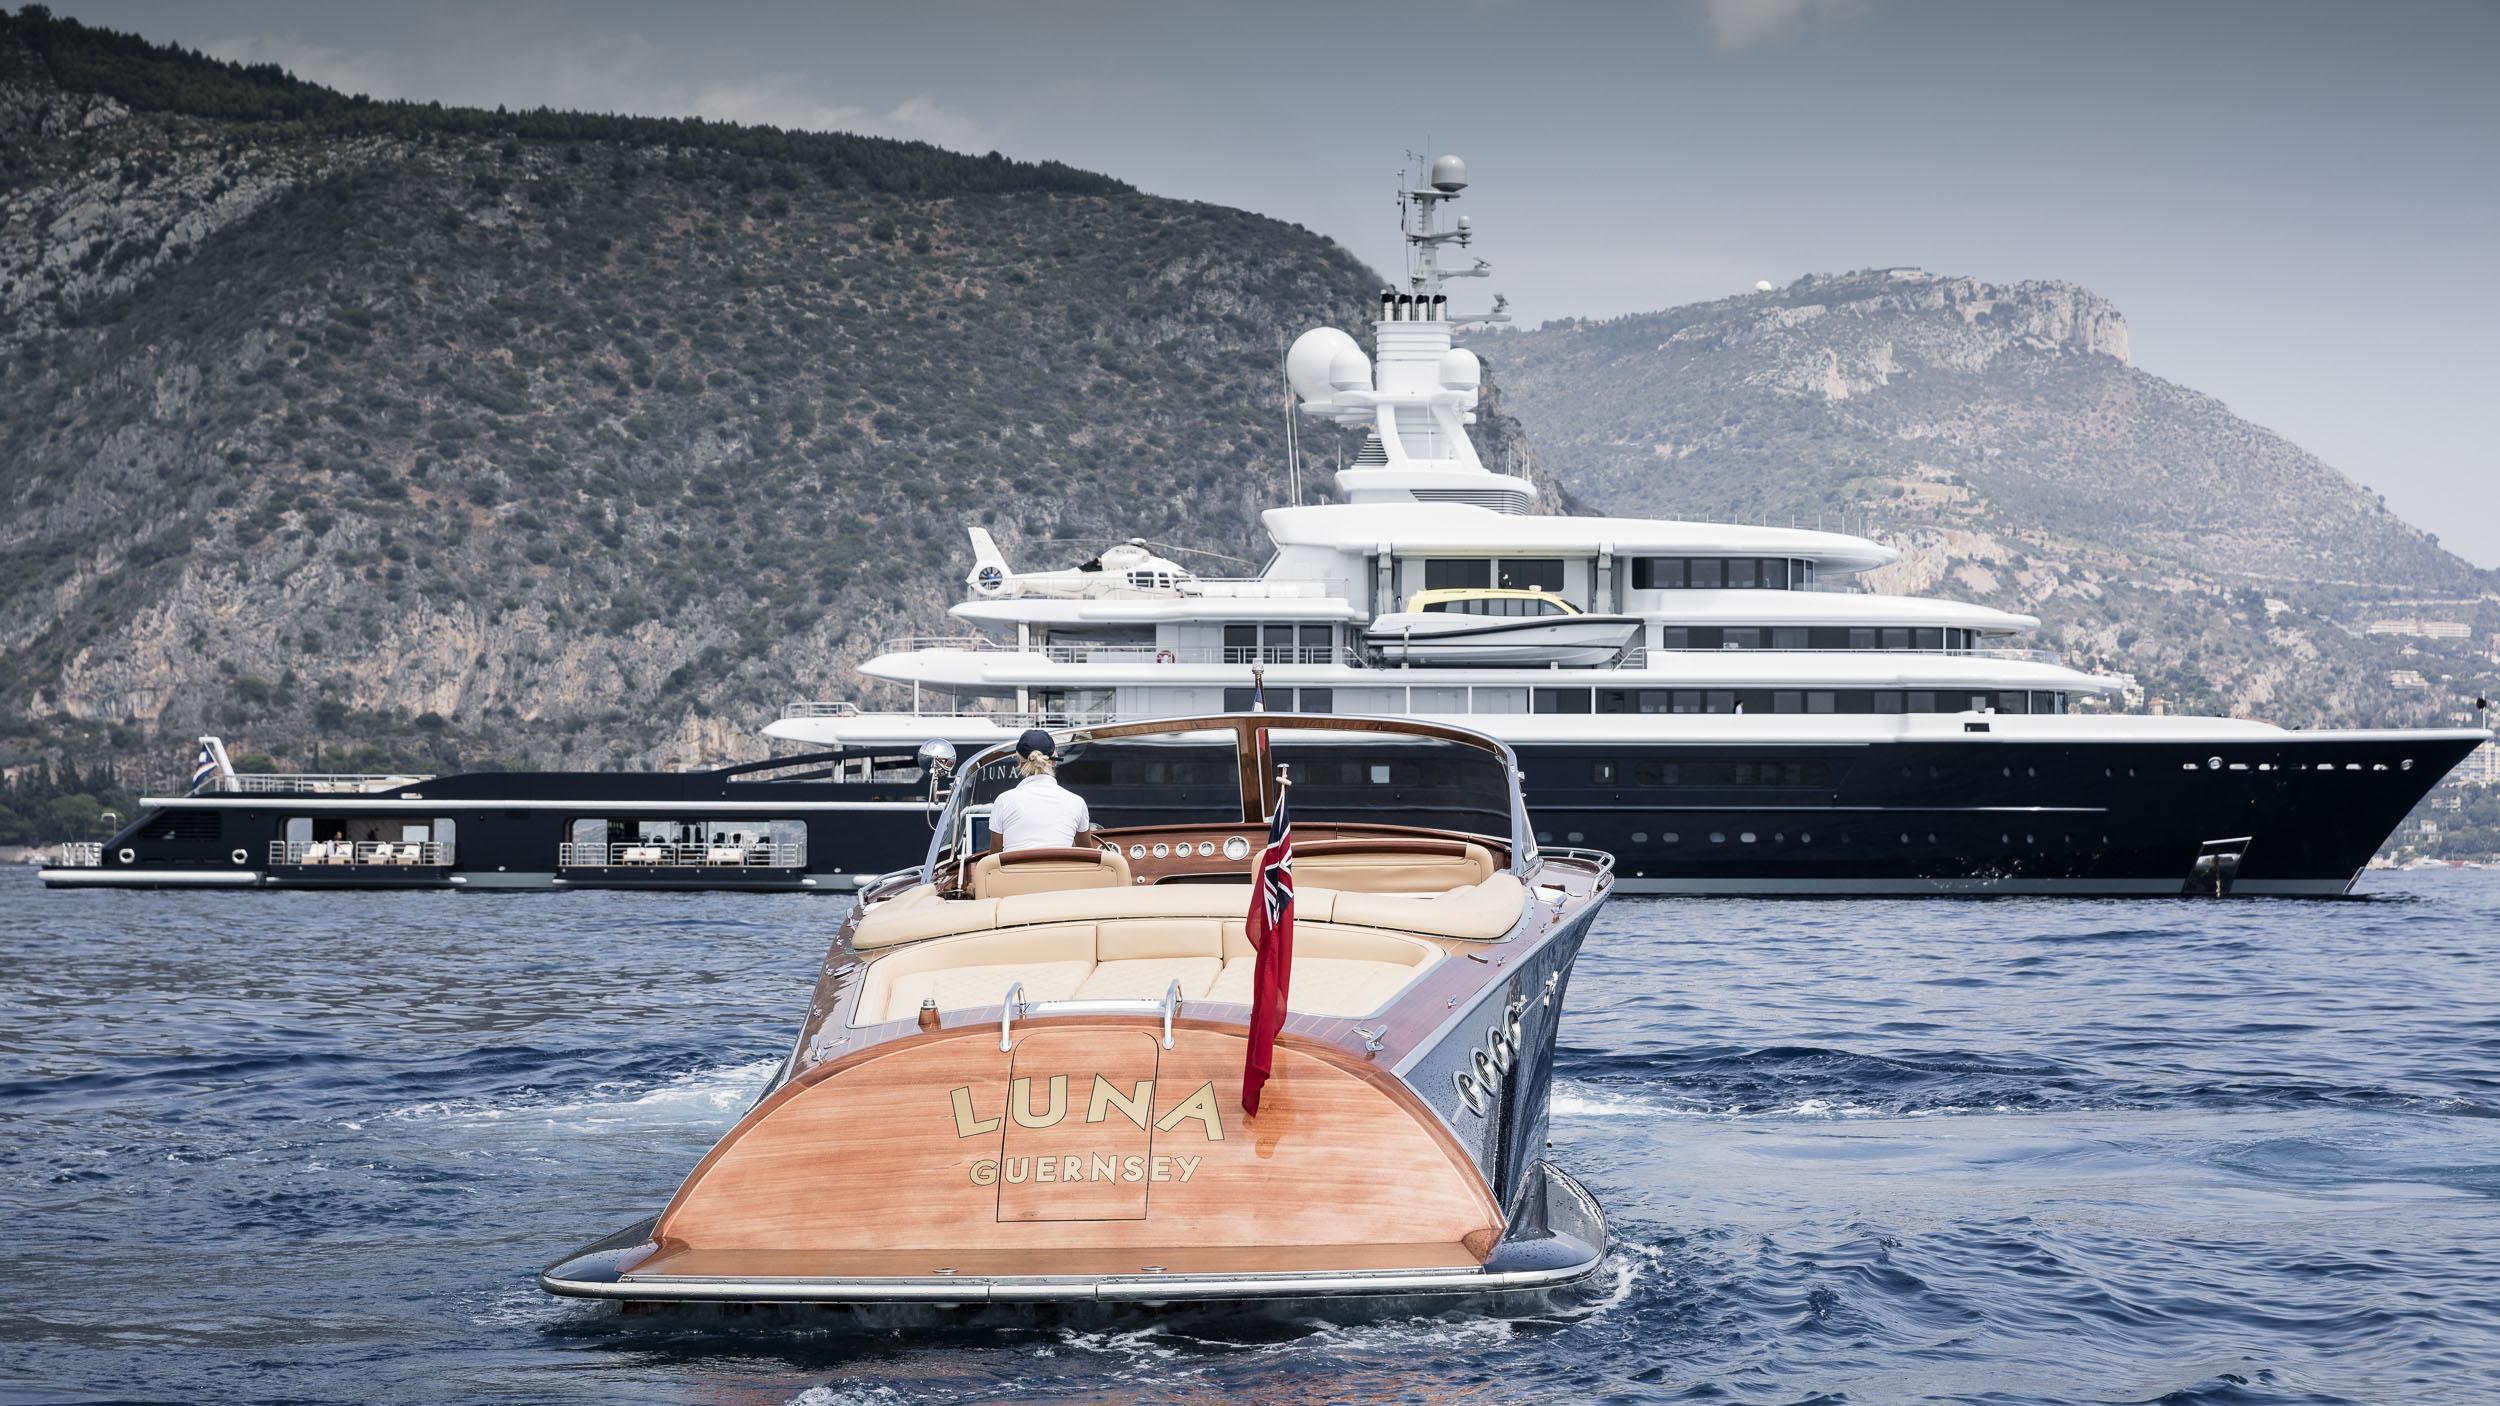 luna superyacht lloyd werft 2010 115m profile and tender